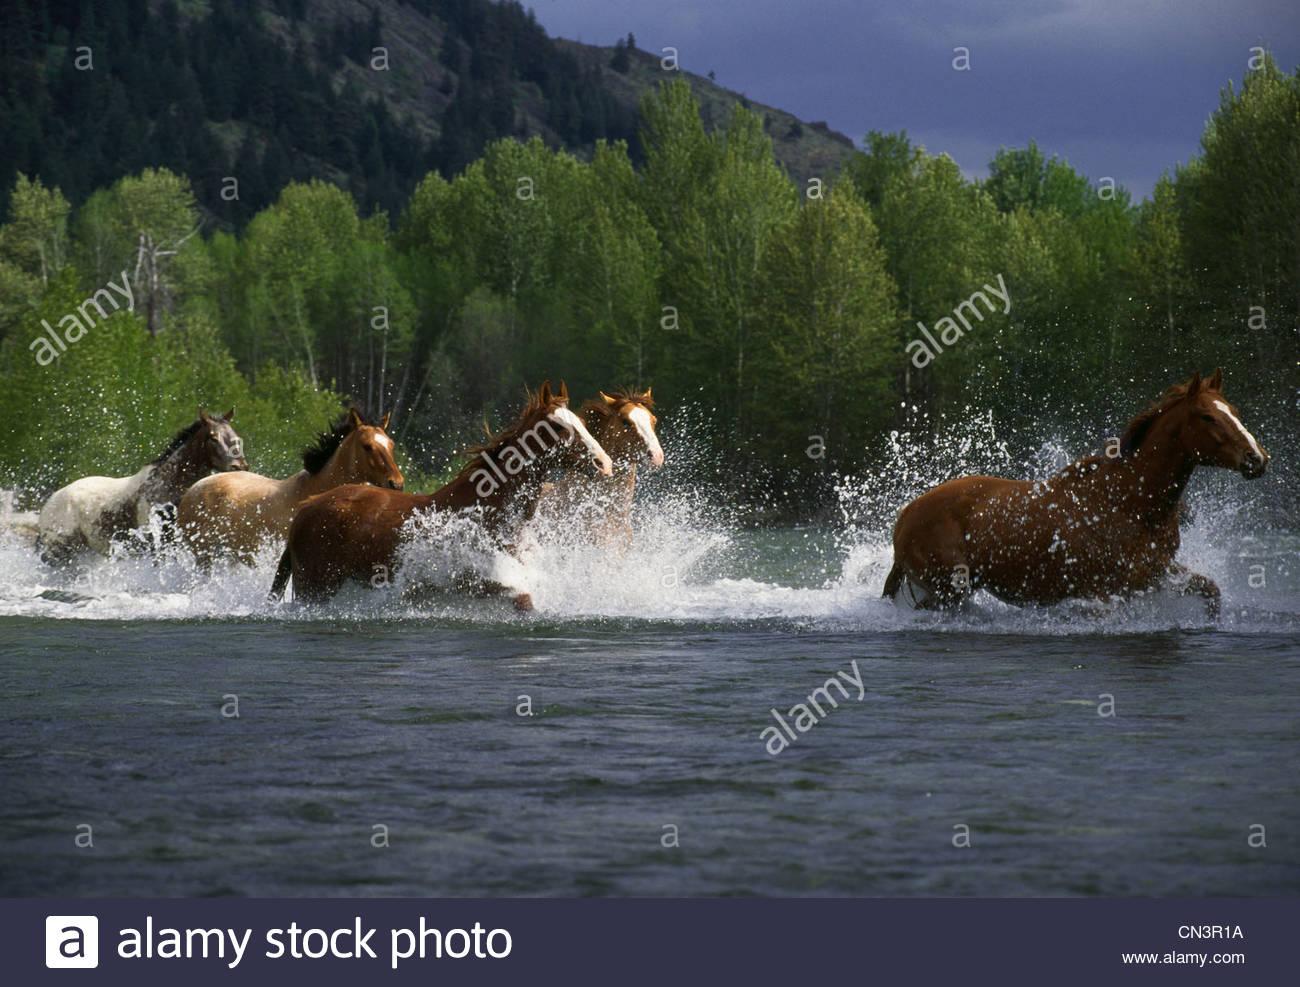 Horses running through a river in Washington - Stock Image